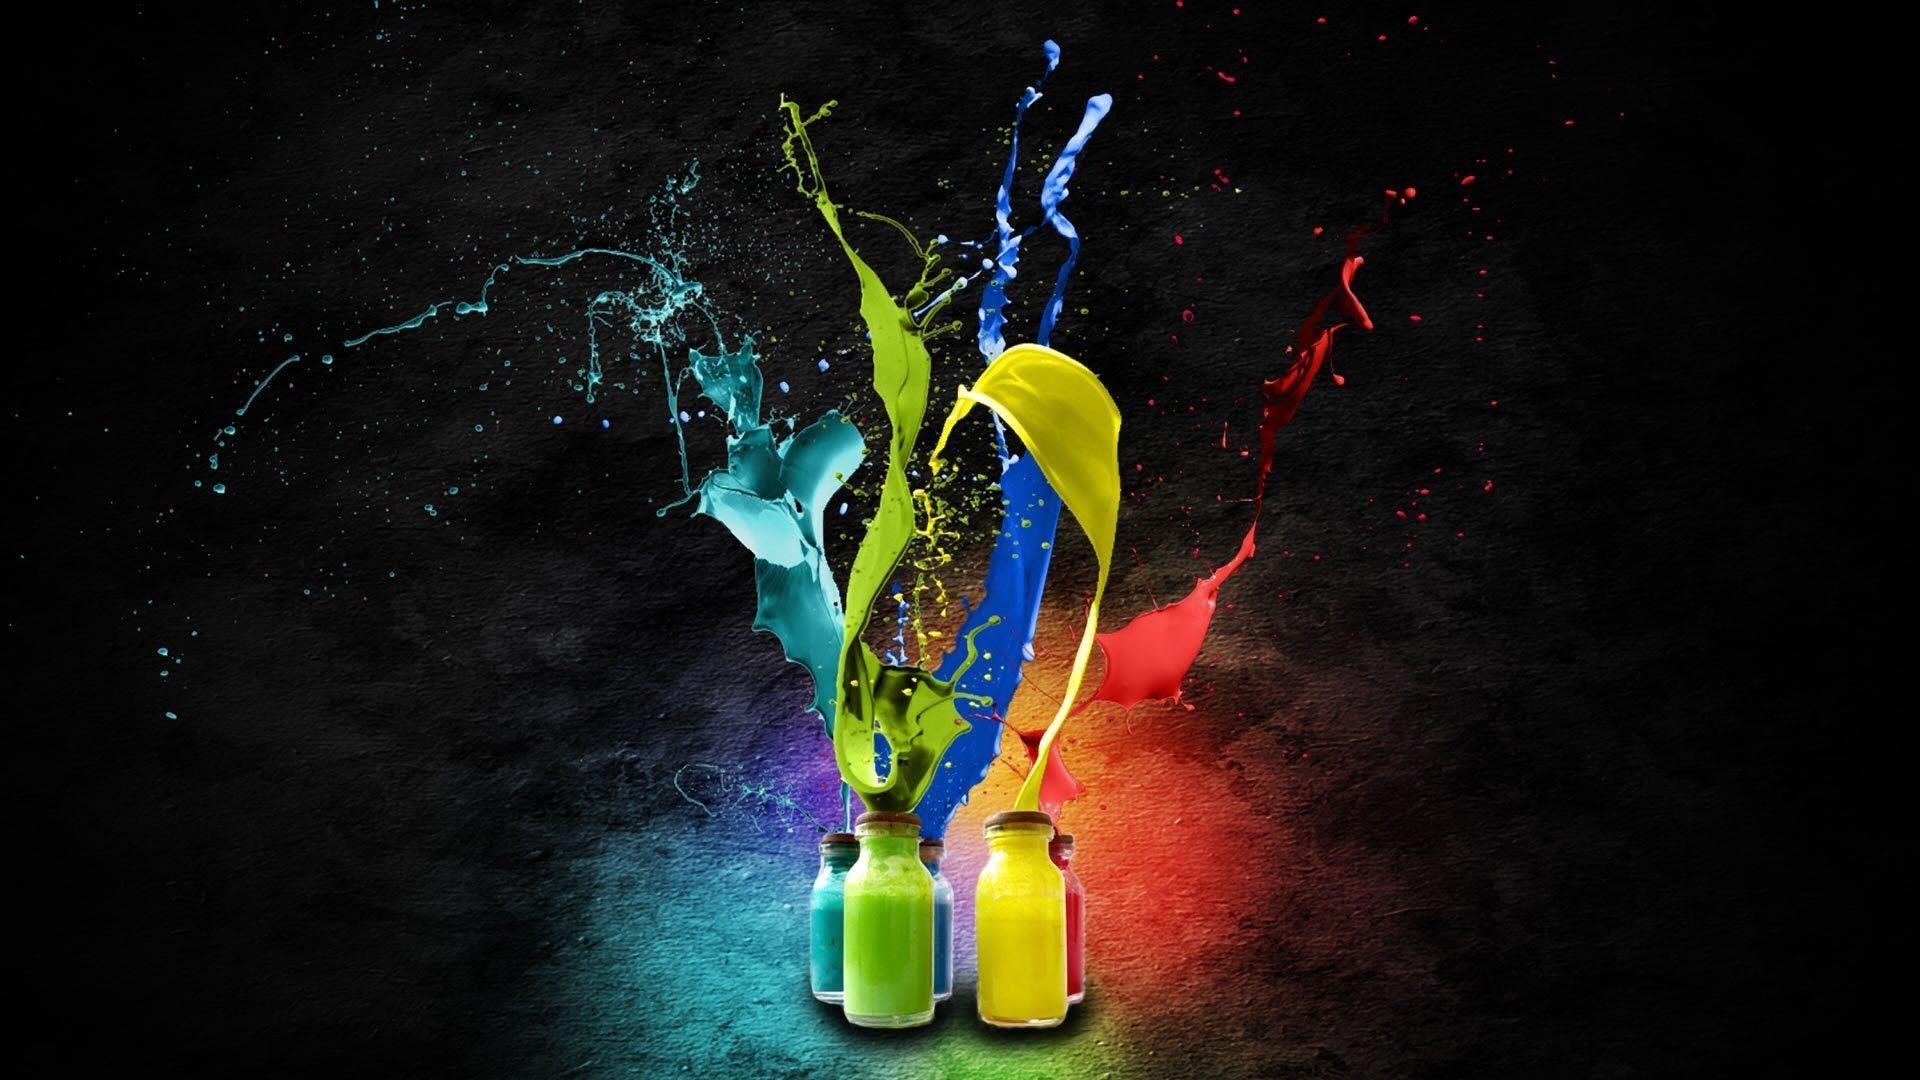 Colourful Paint Splash - Colourful Paint Splash